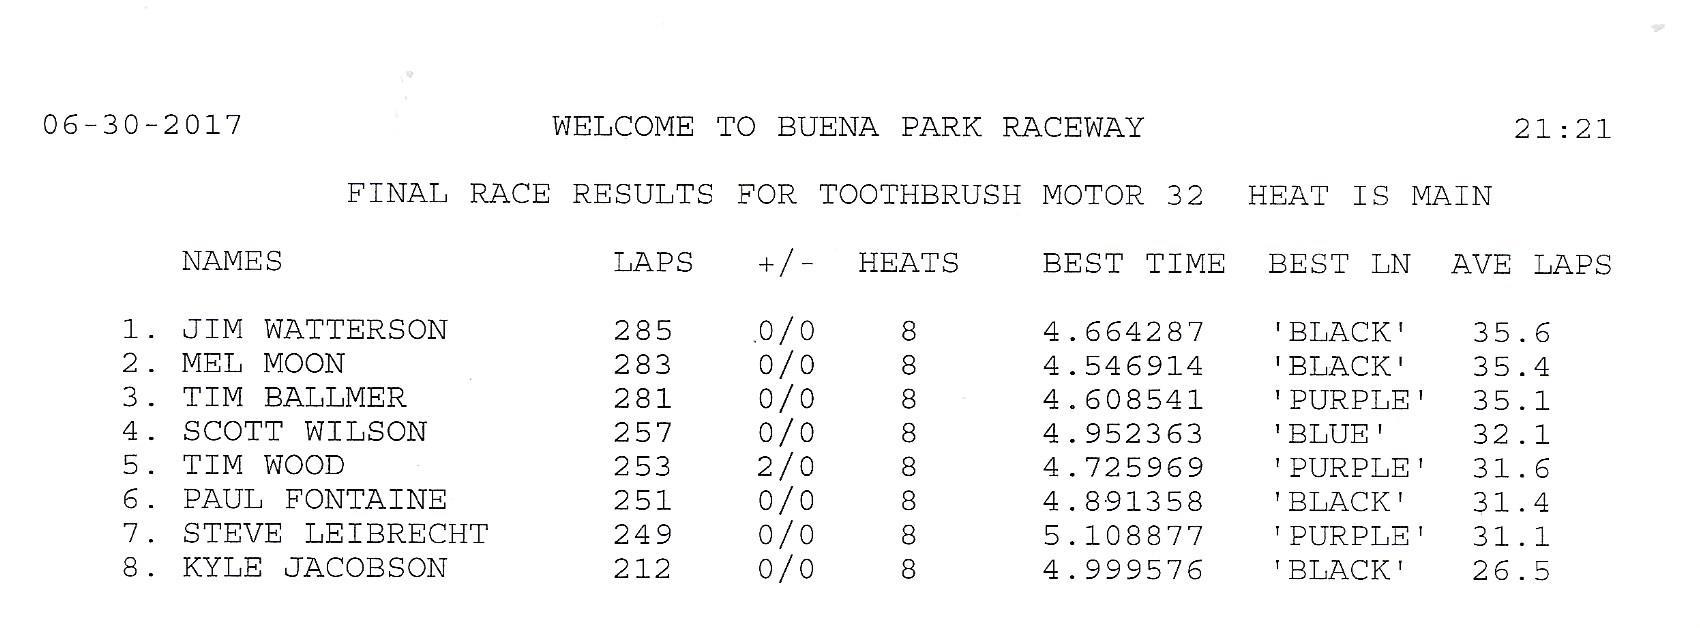 63017 results.jpeg